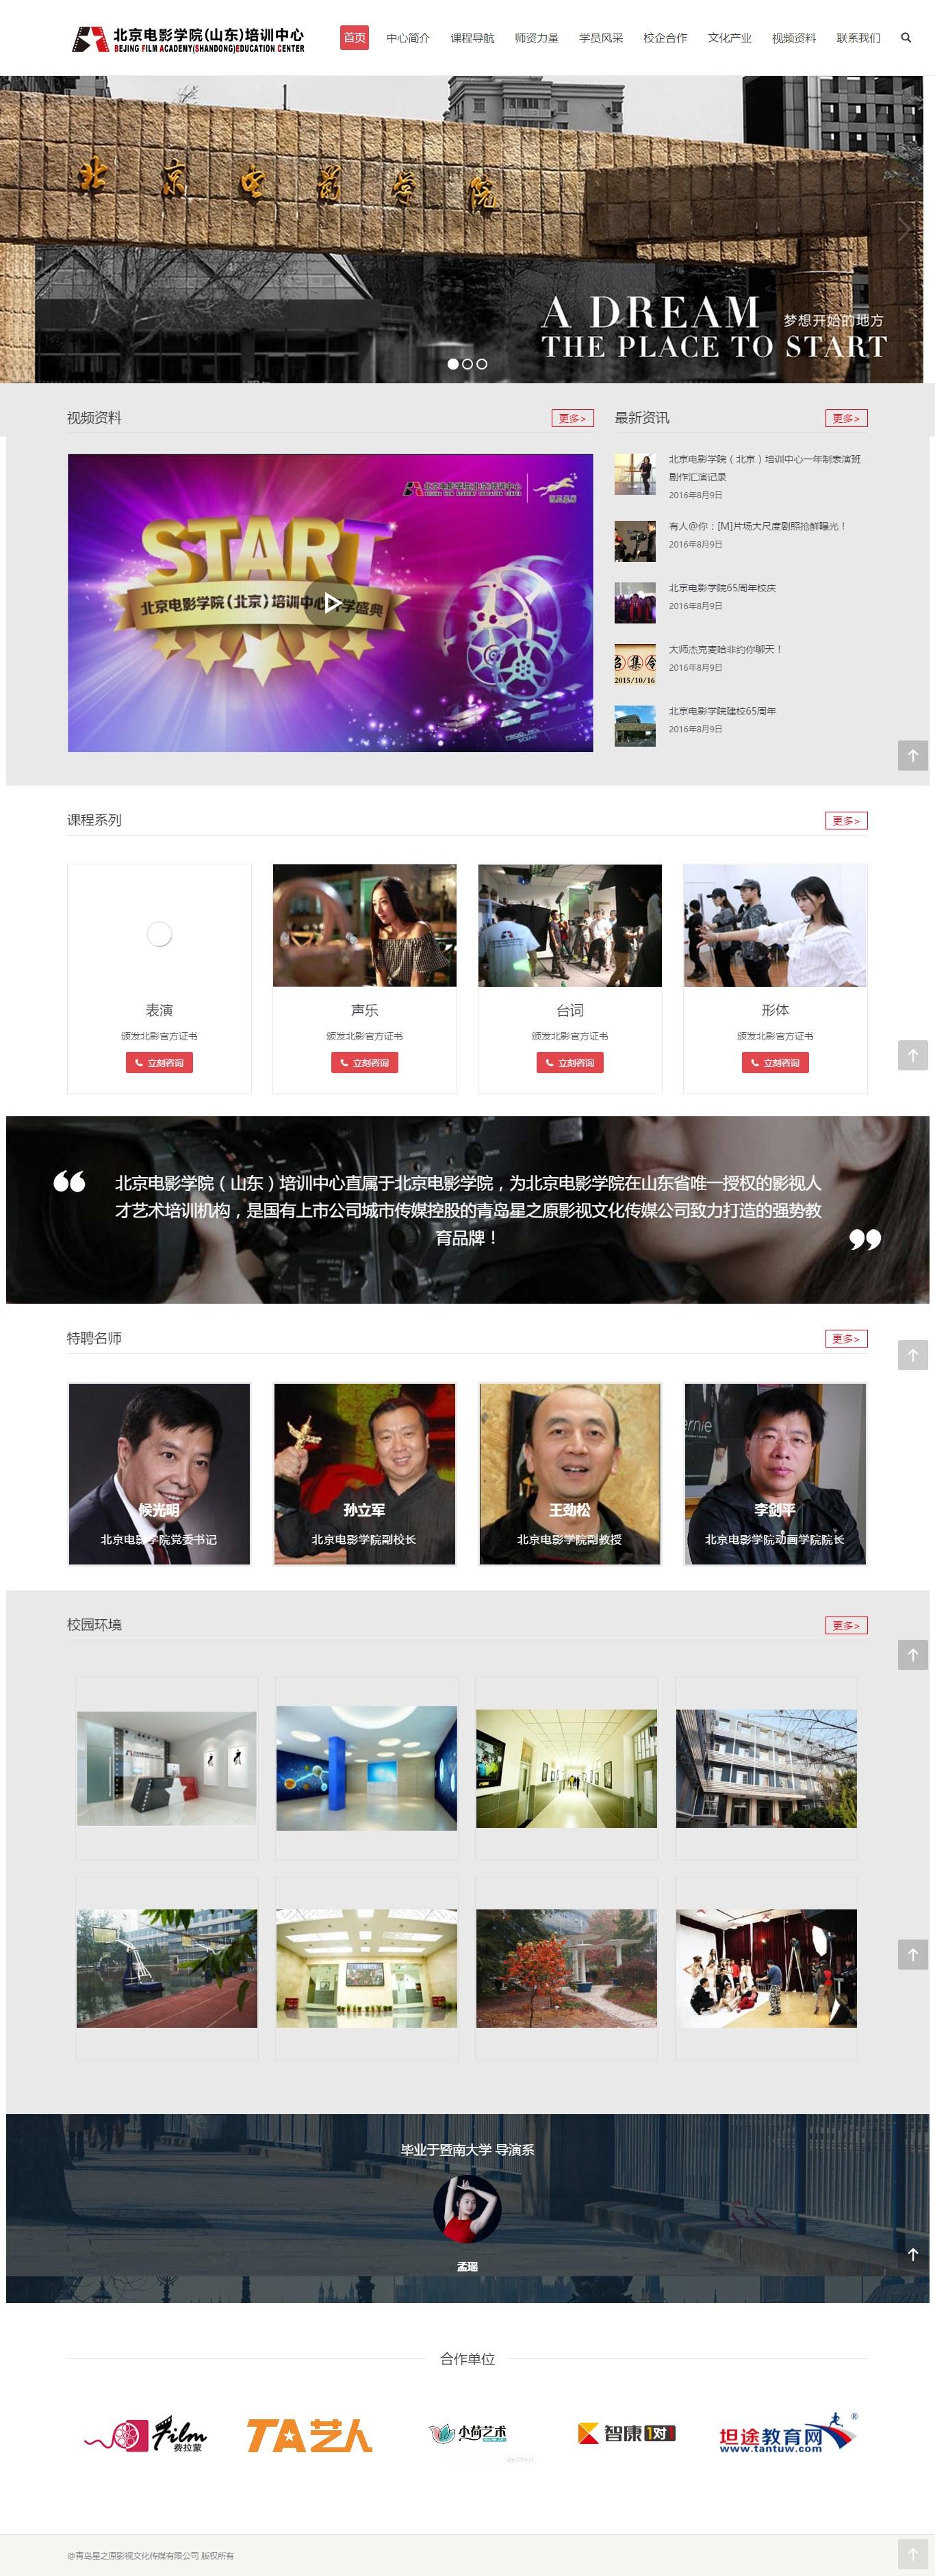 homeup 北京电影学院(山东)培训中心